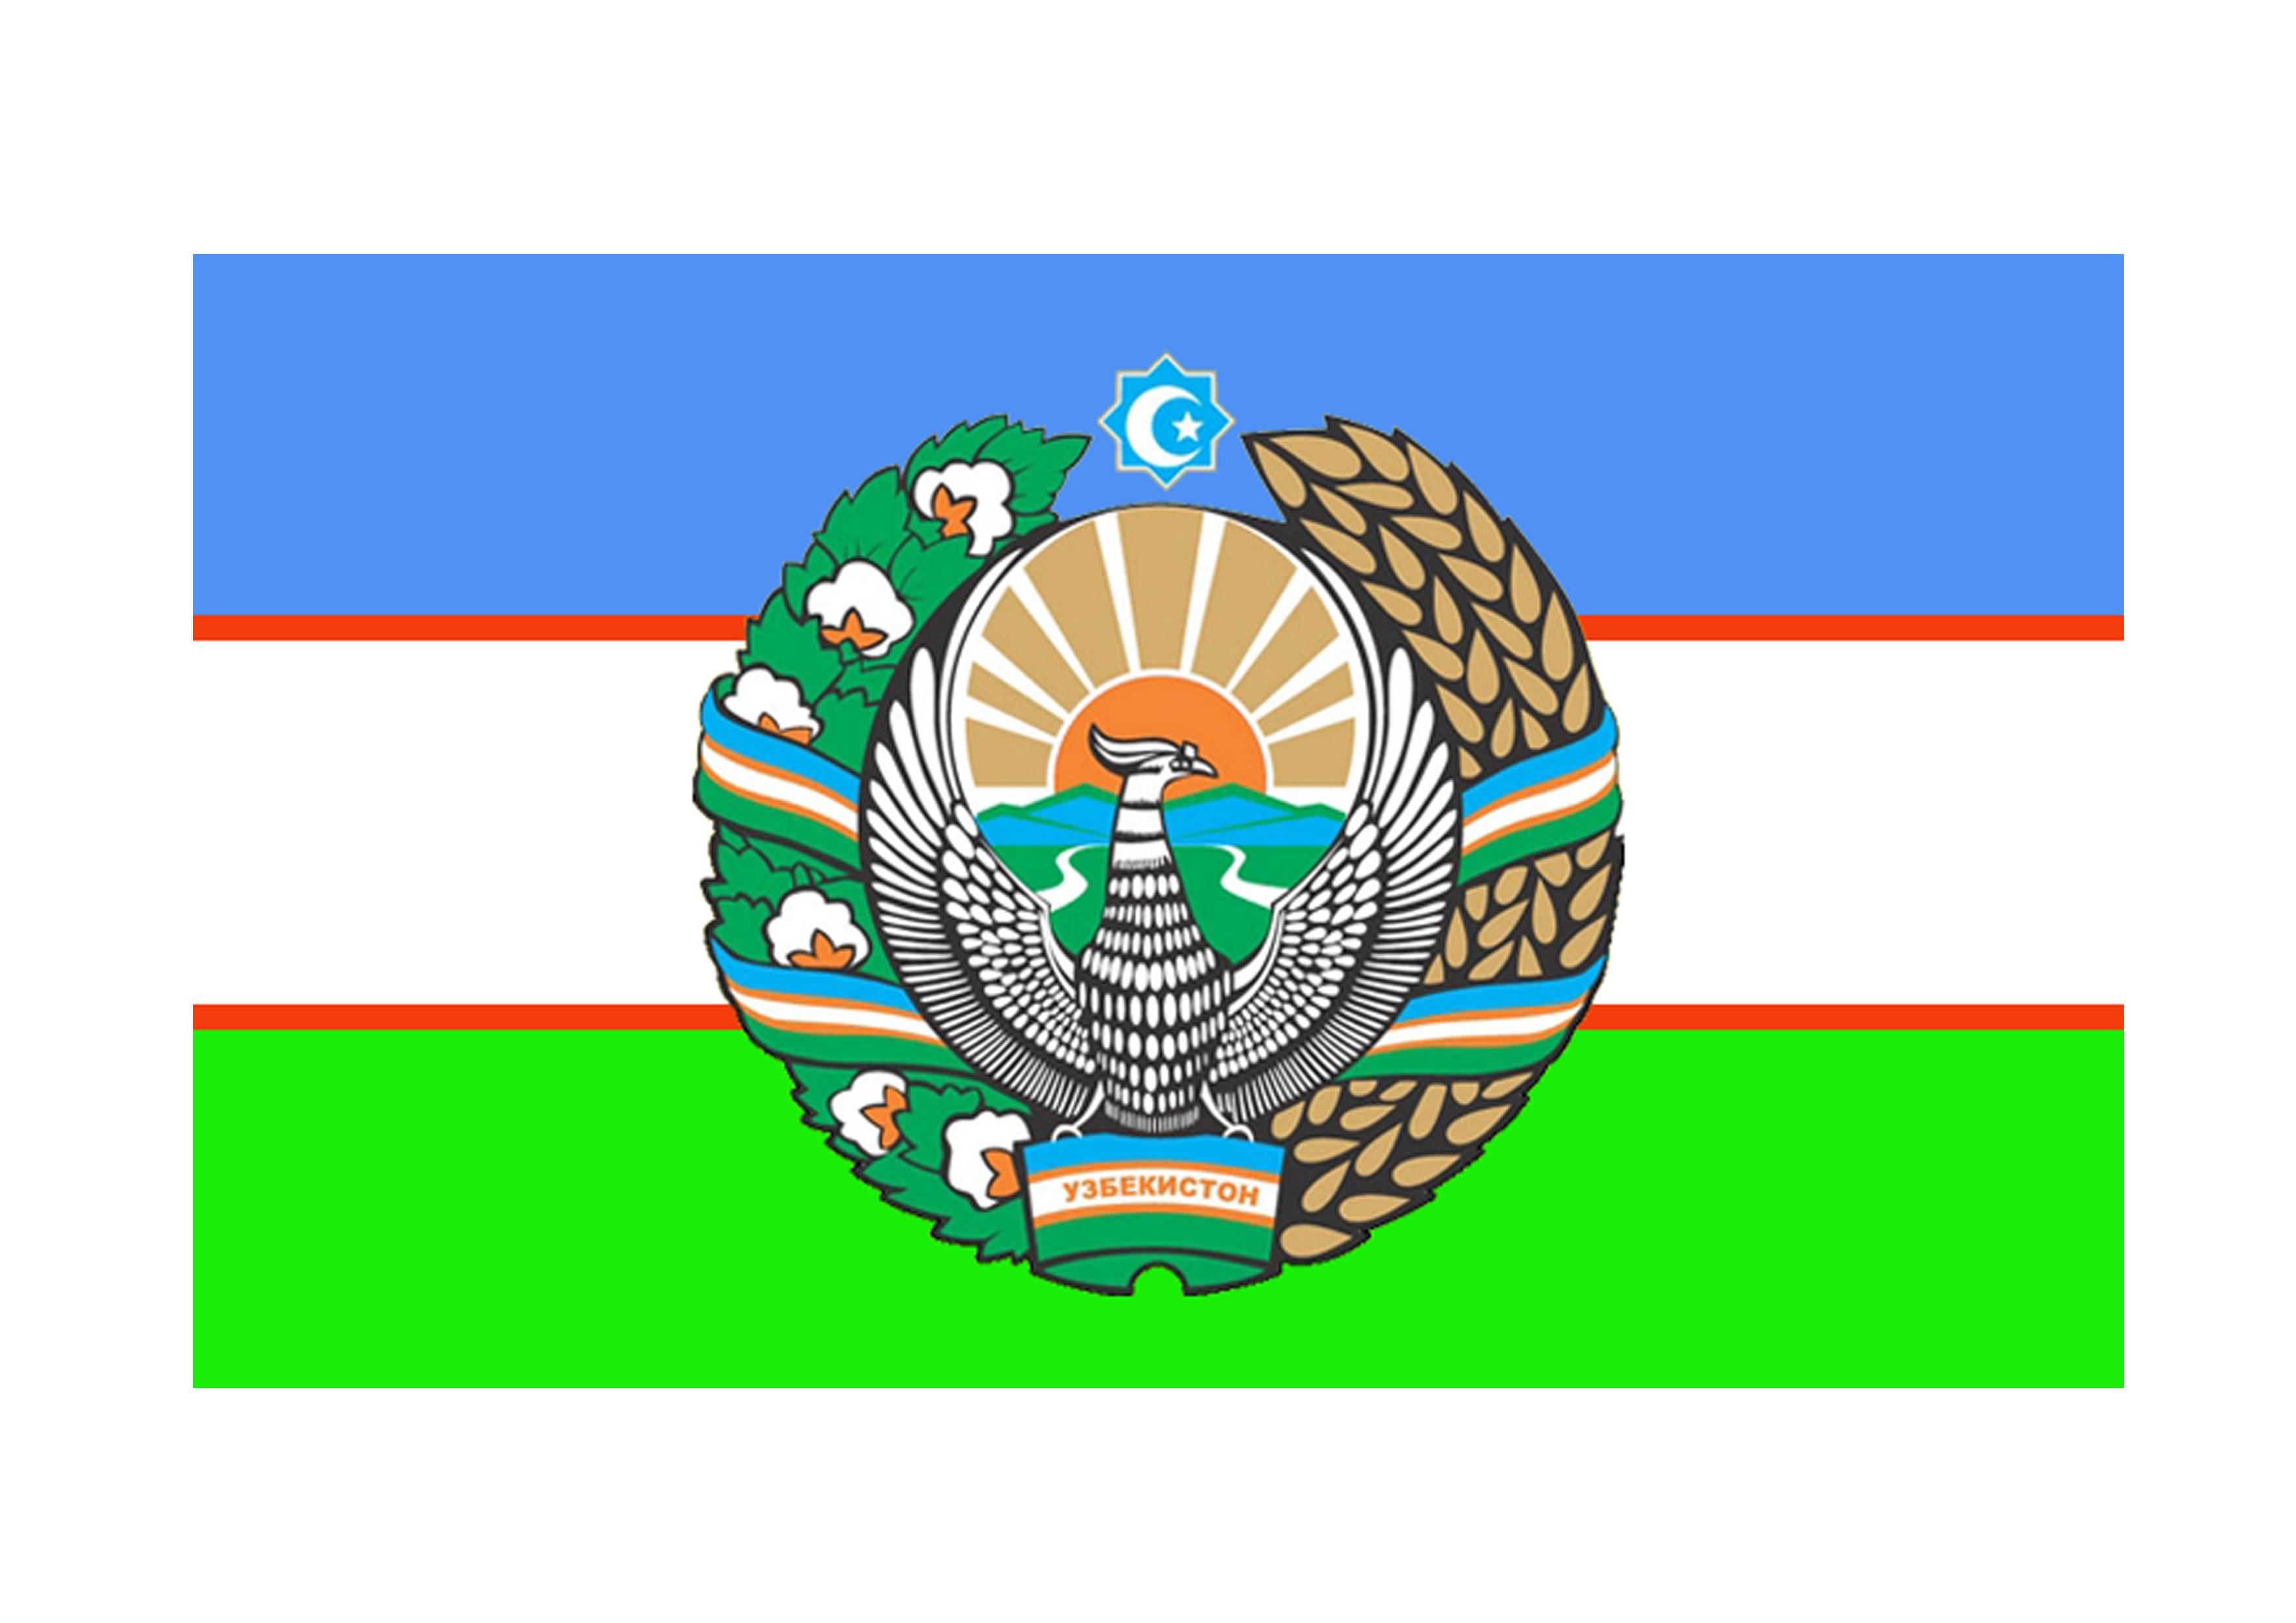 File:Uzbekistan Flag and Coat of arms.jpg - Wikimedia Commons